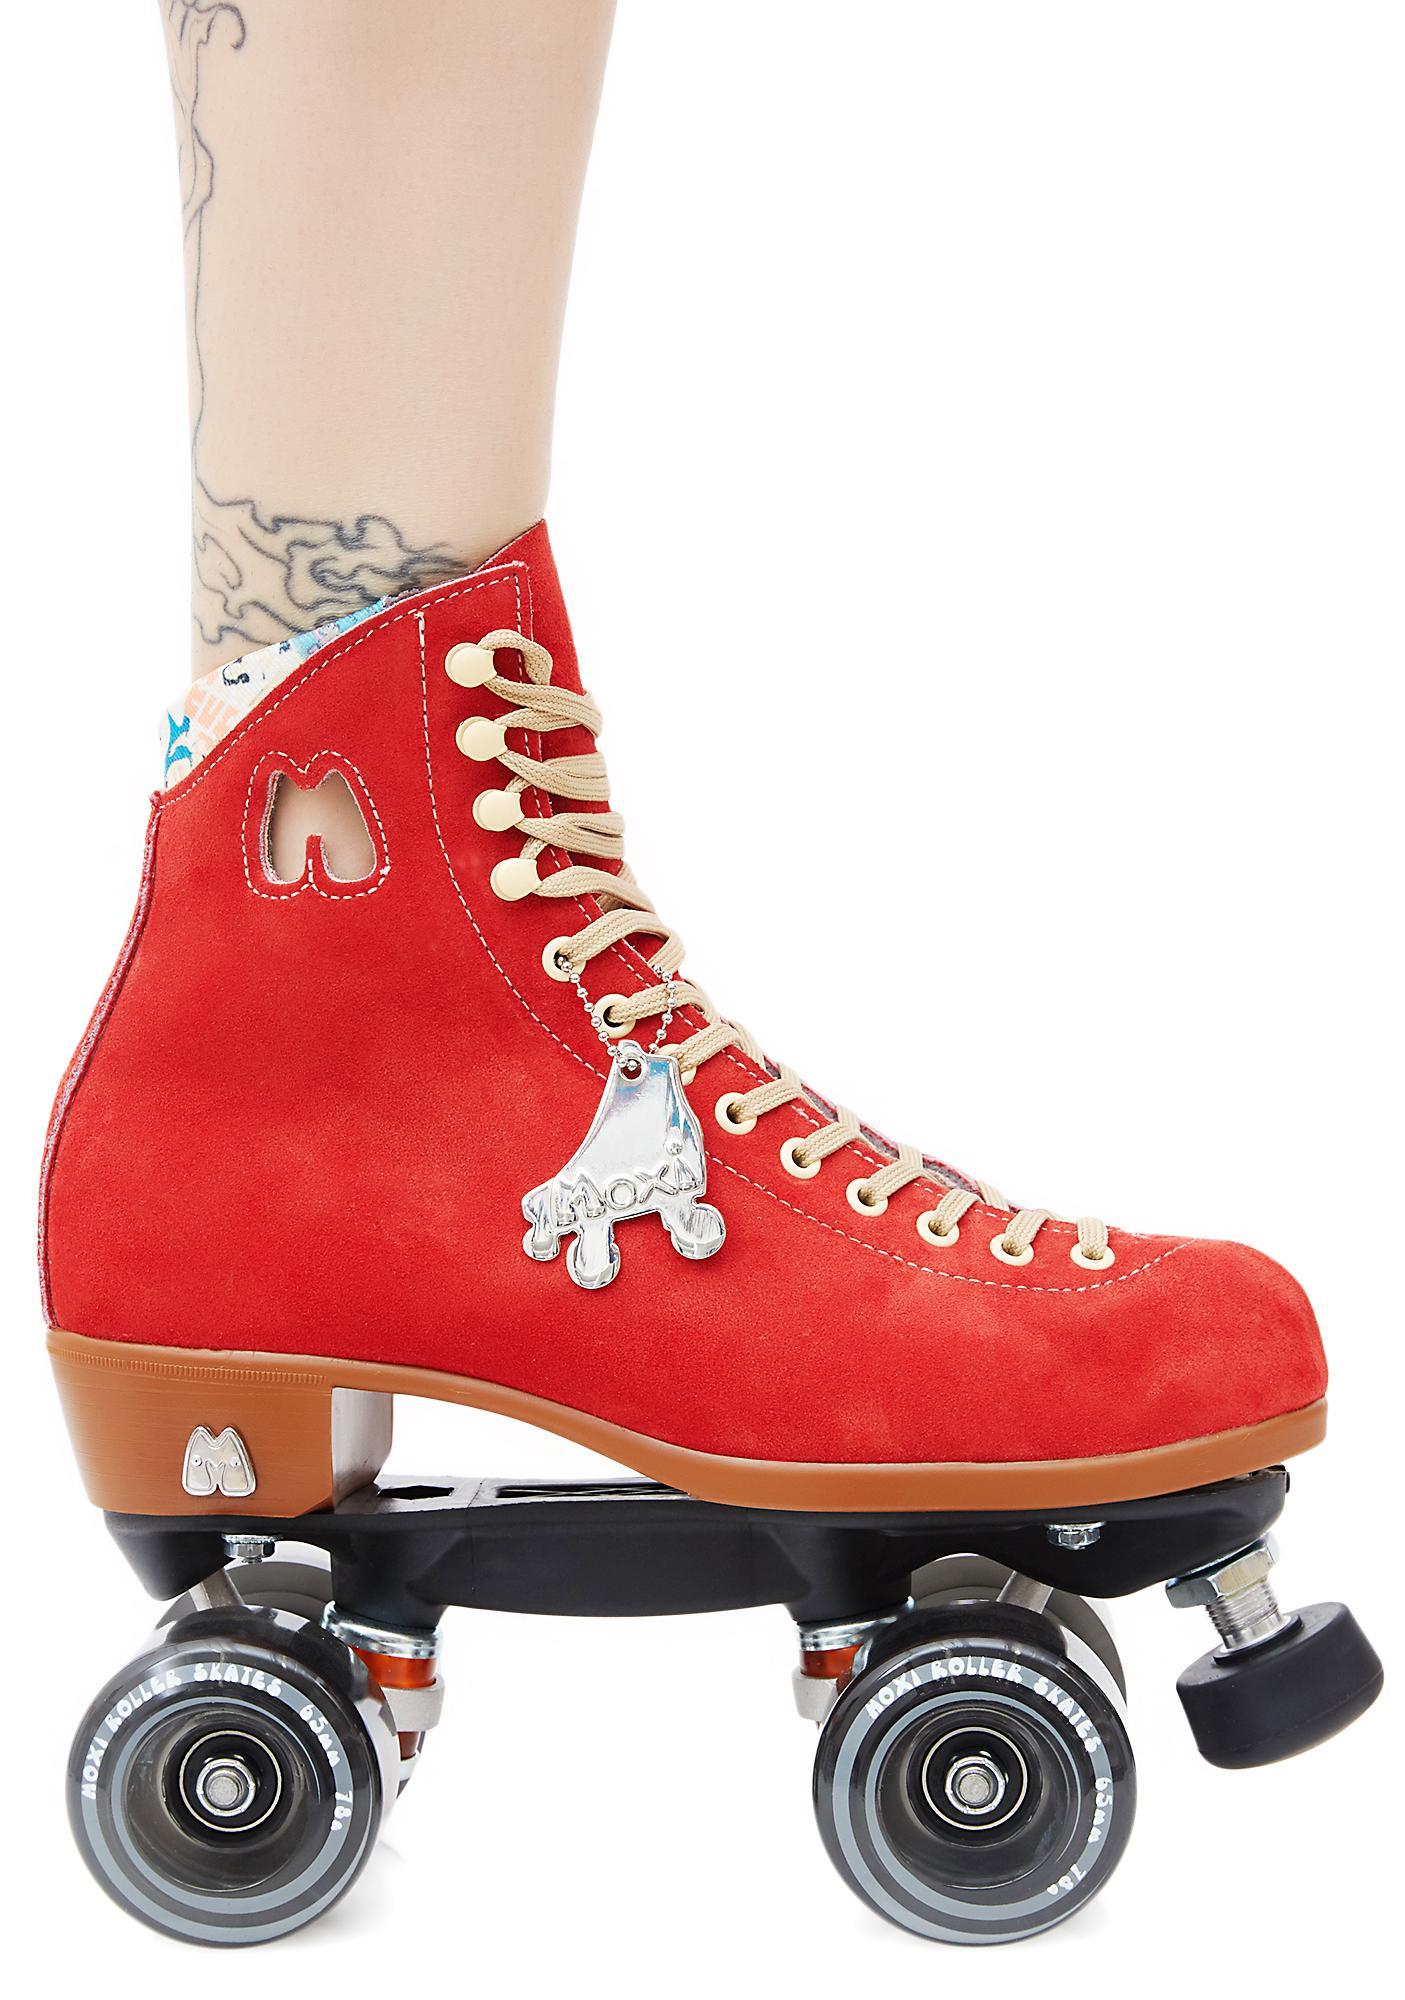 Roller skating shoes price in pakistan -  Moxi Roller Skates Poppy Lolly Skates